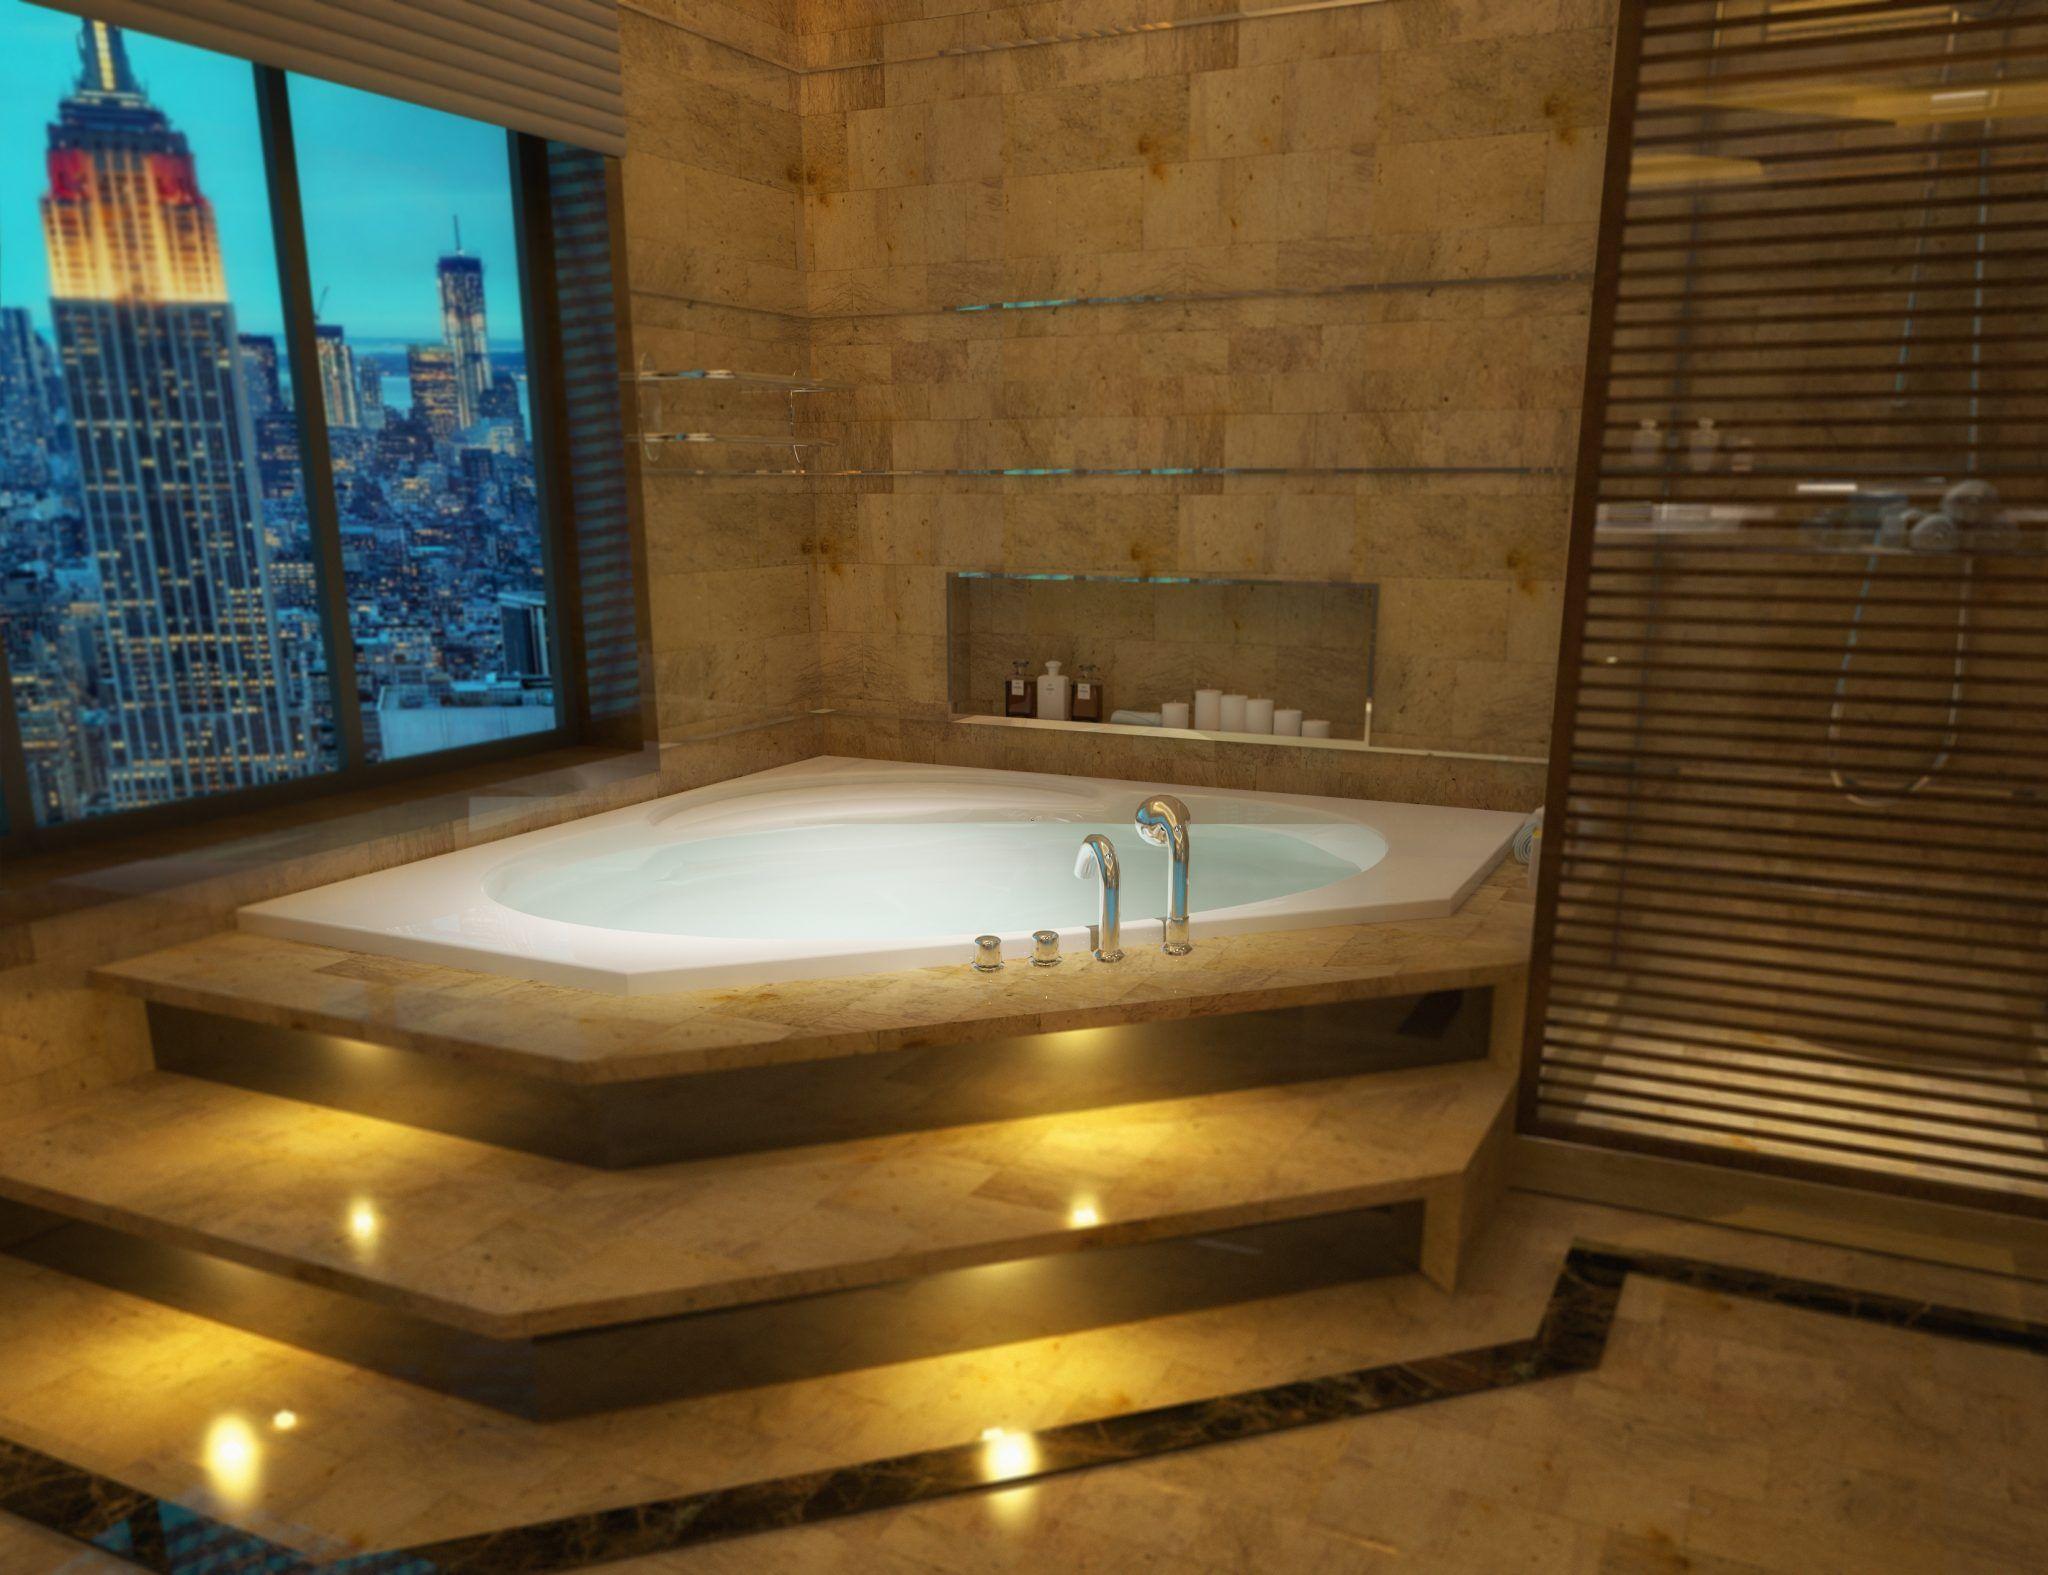 48x48 Corner Tub Br 49 Bathtubs Com Corner Tub Bathroom Design Big Baths